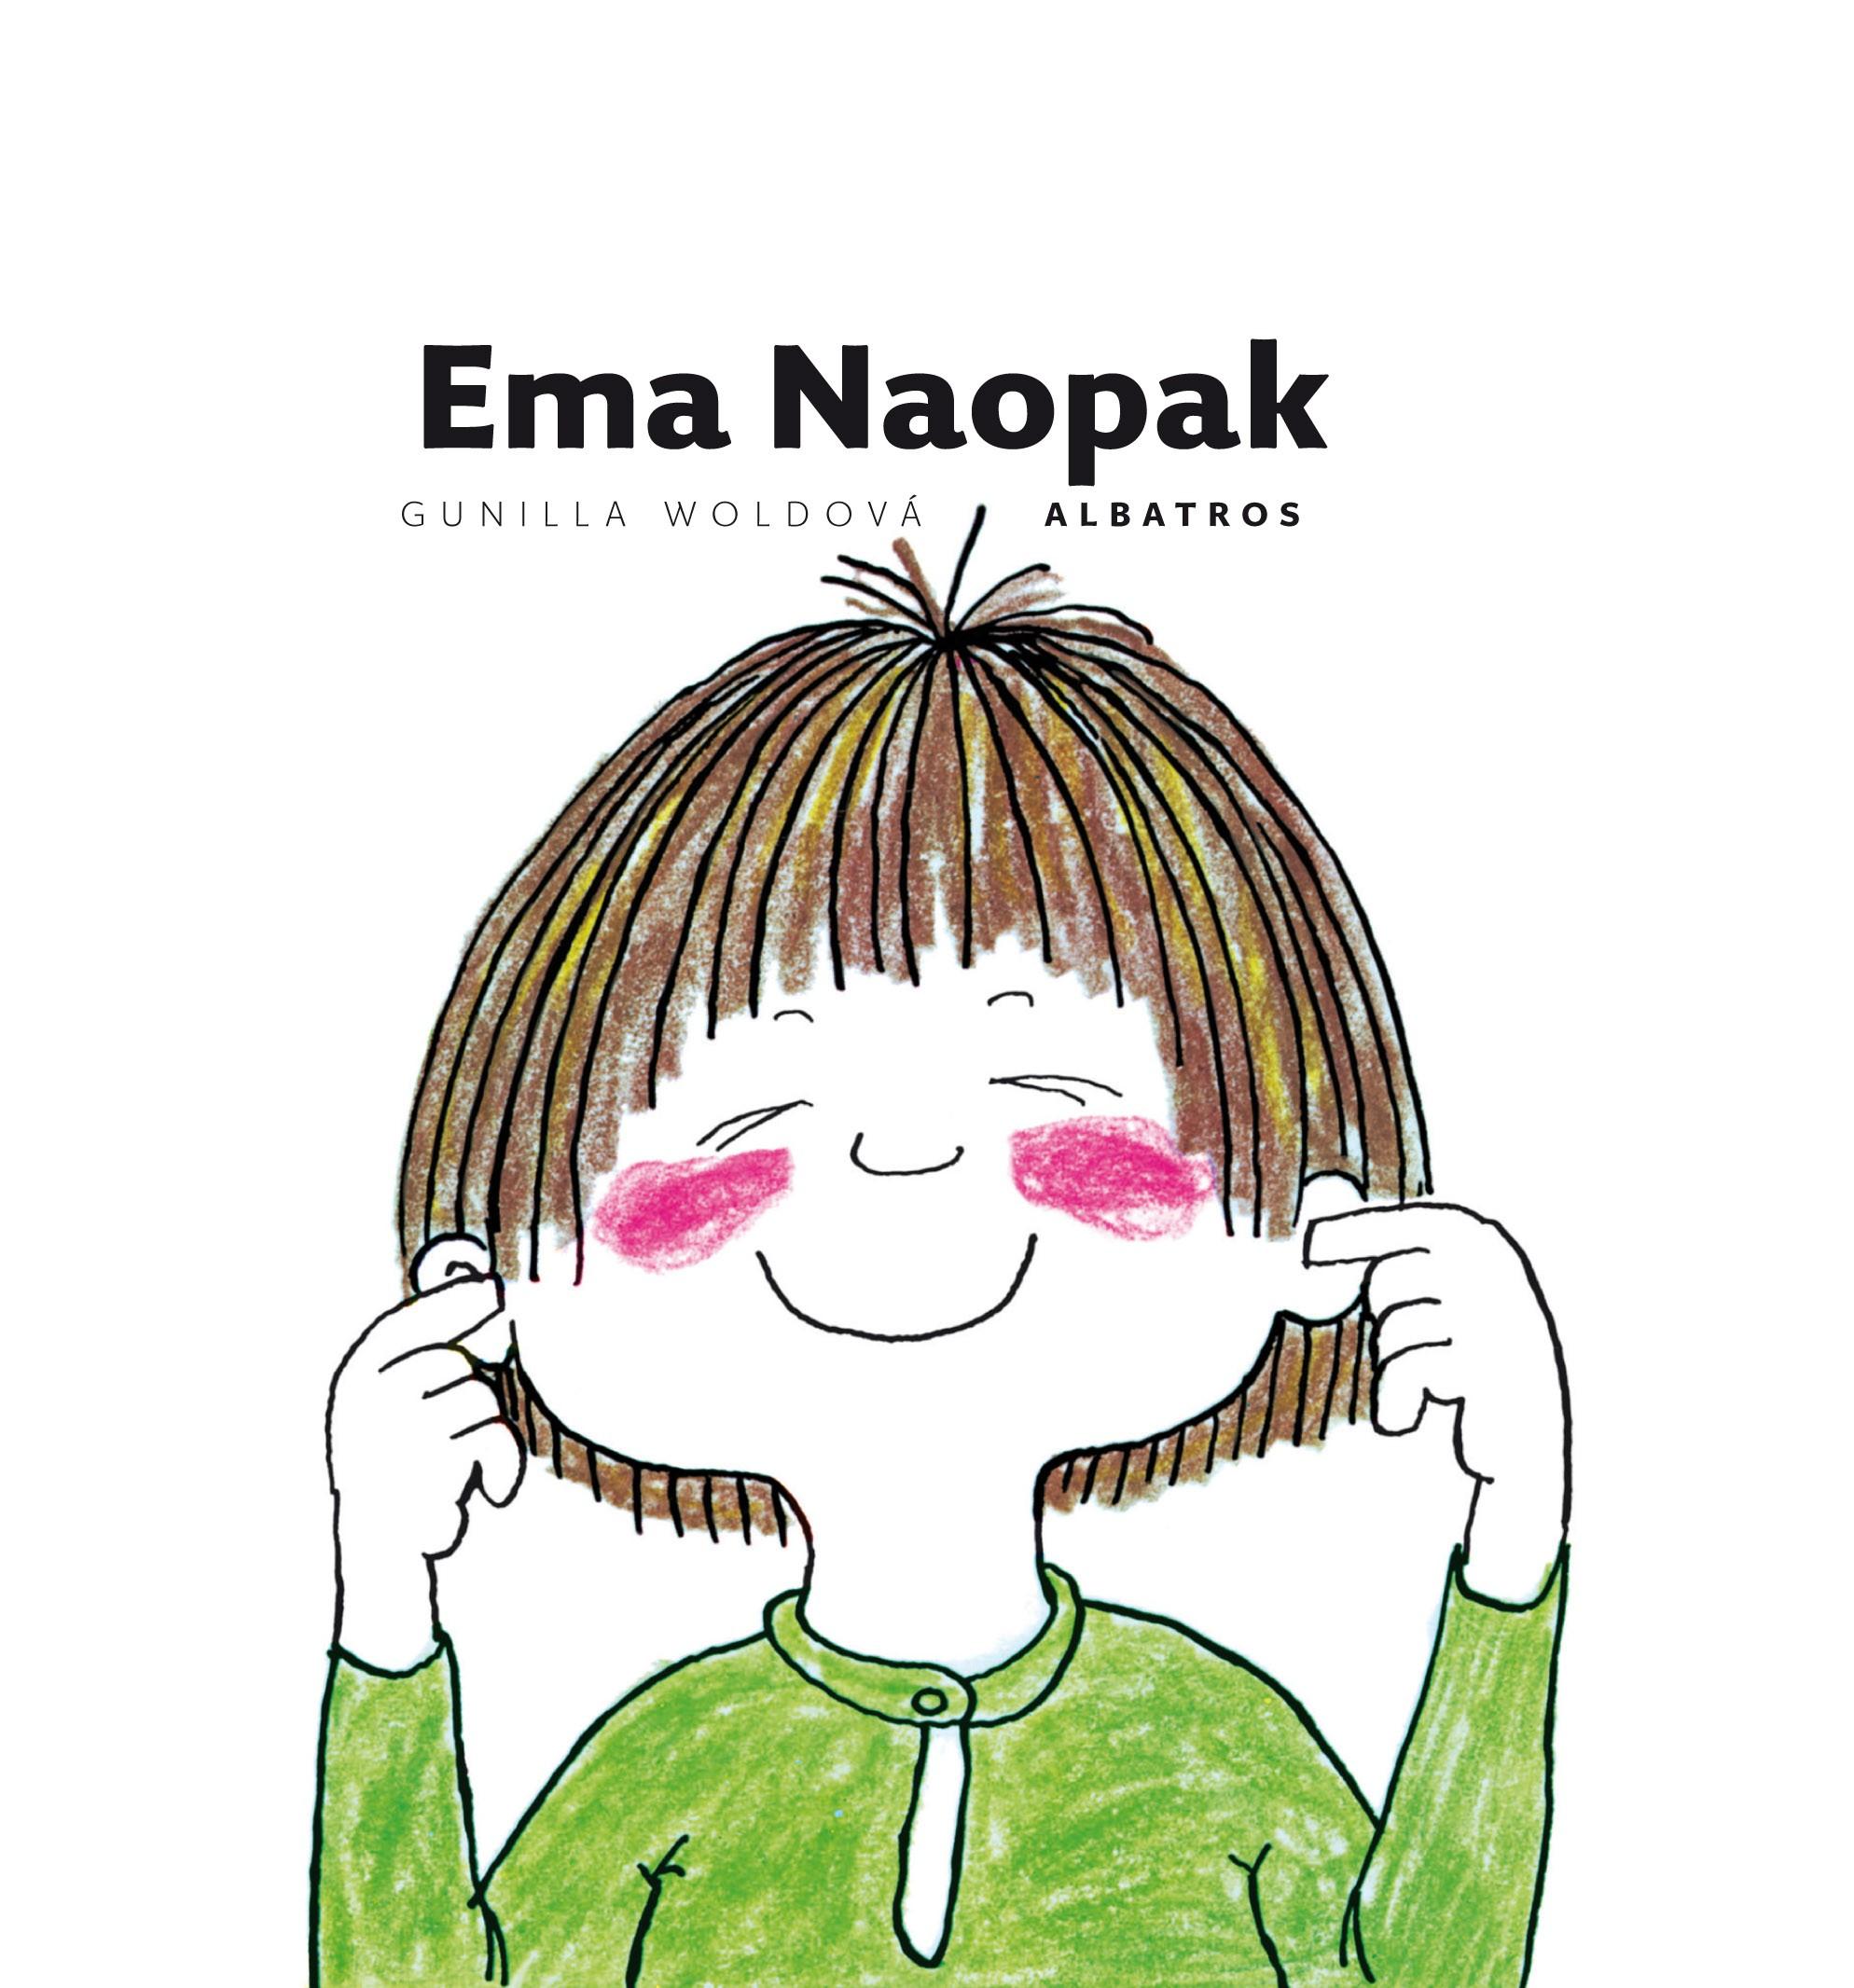 Ema Naopak | Gunilla Woldová, Gunilla Woldová